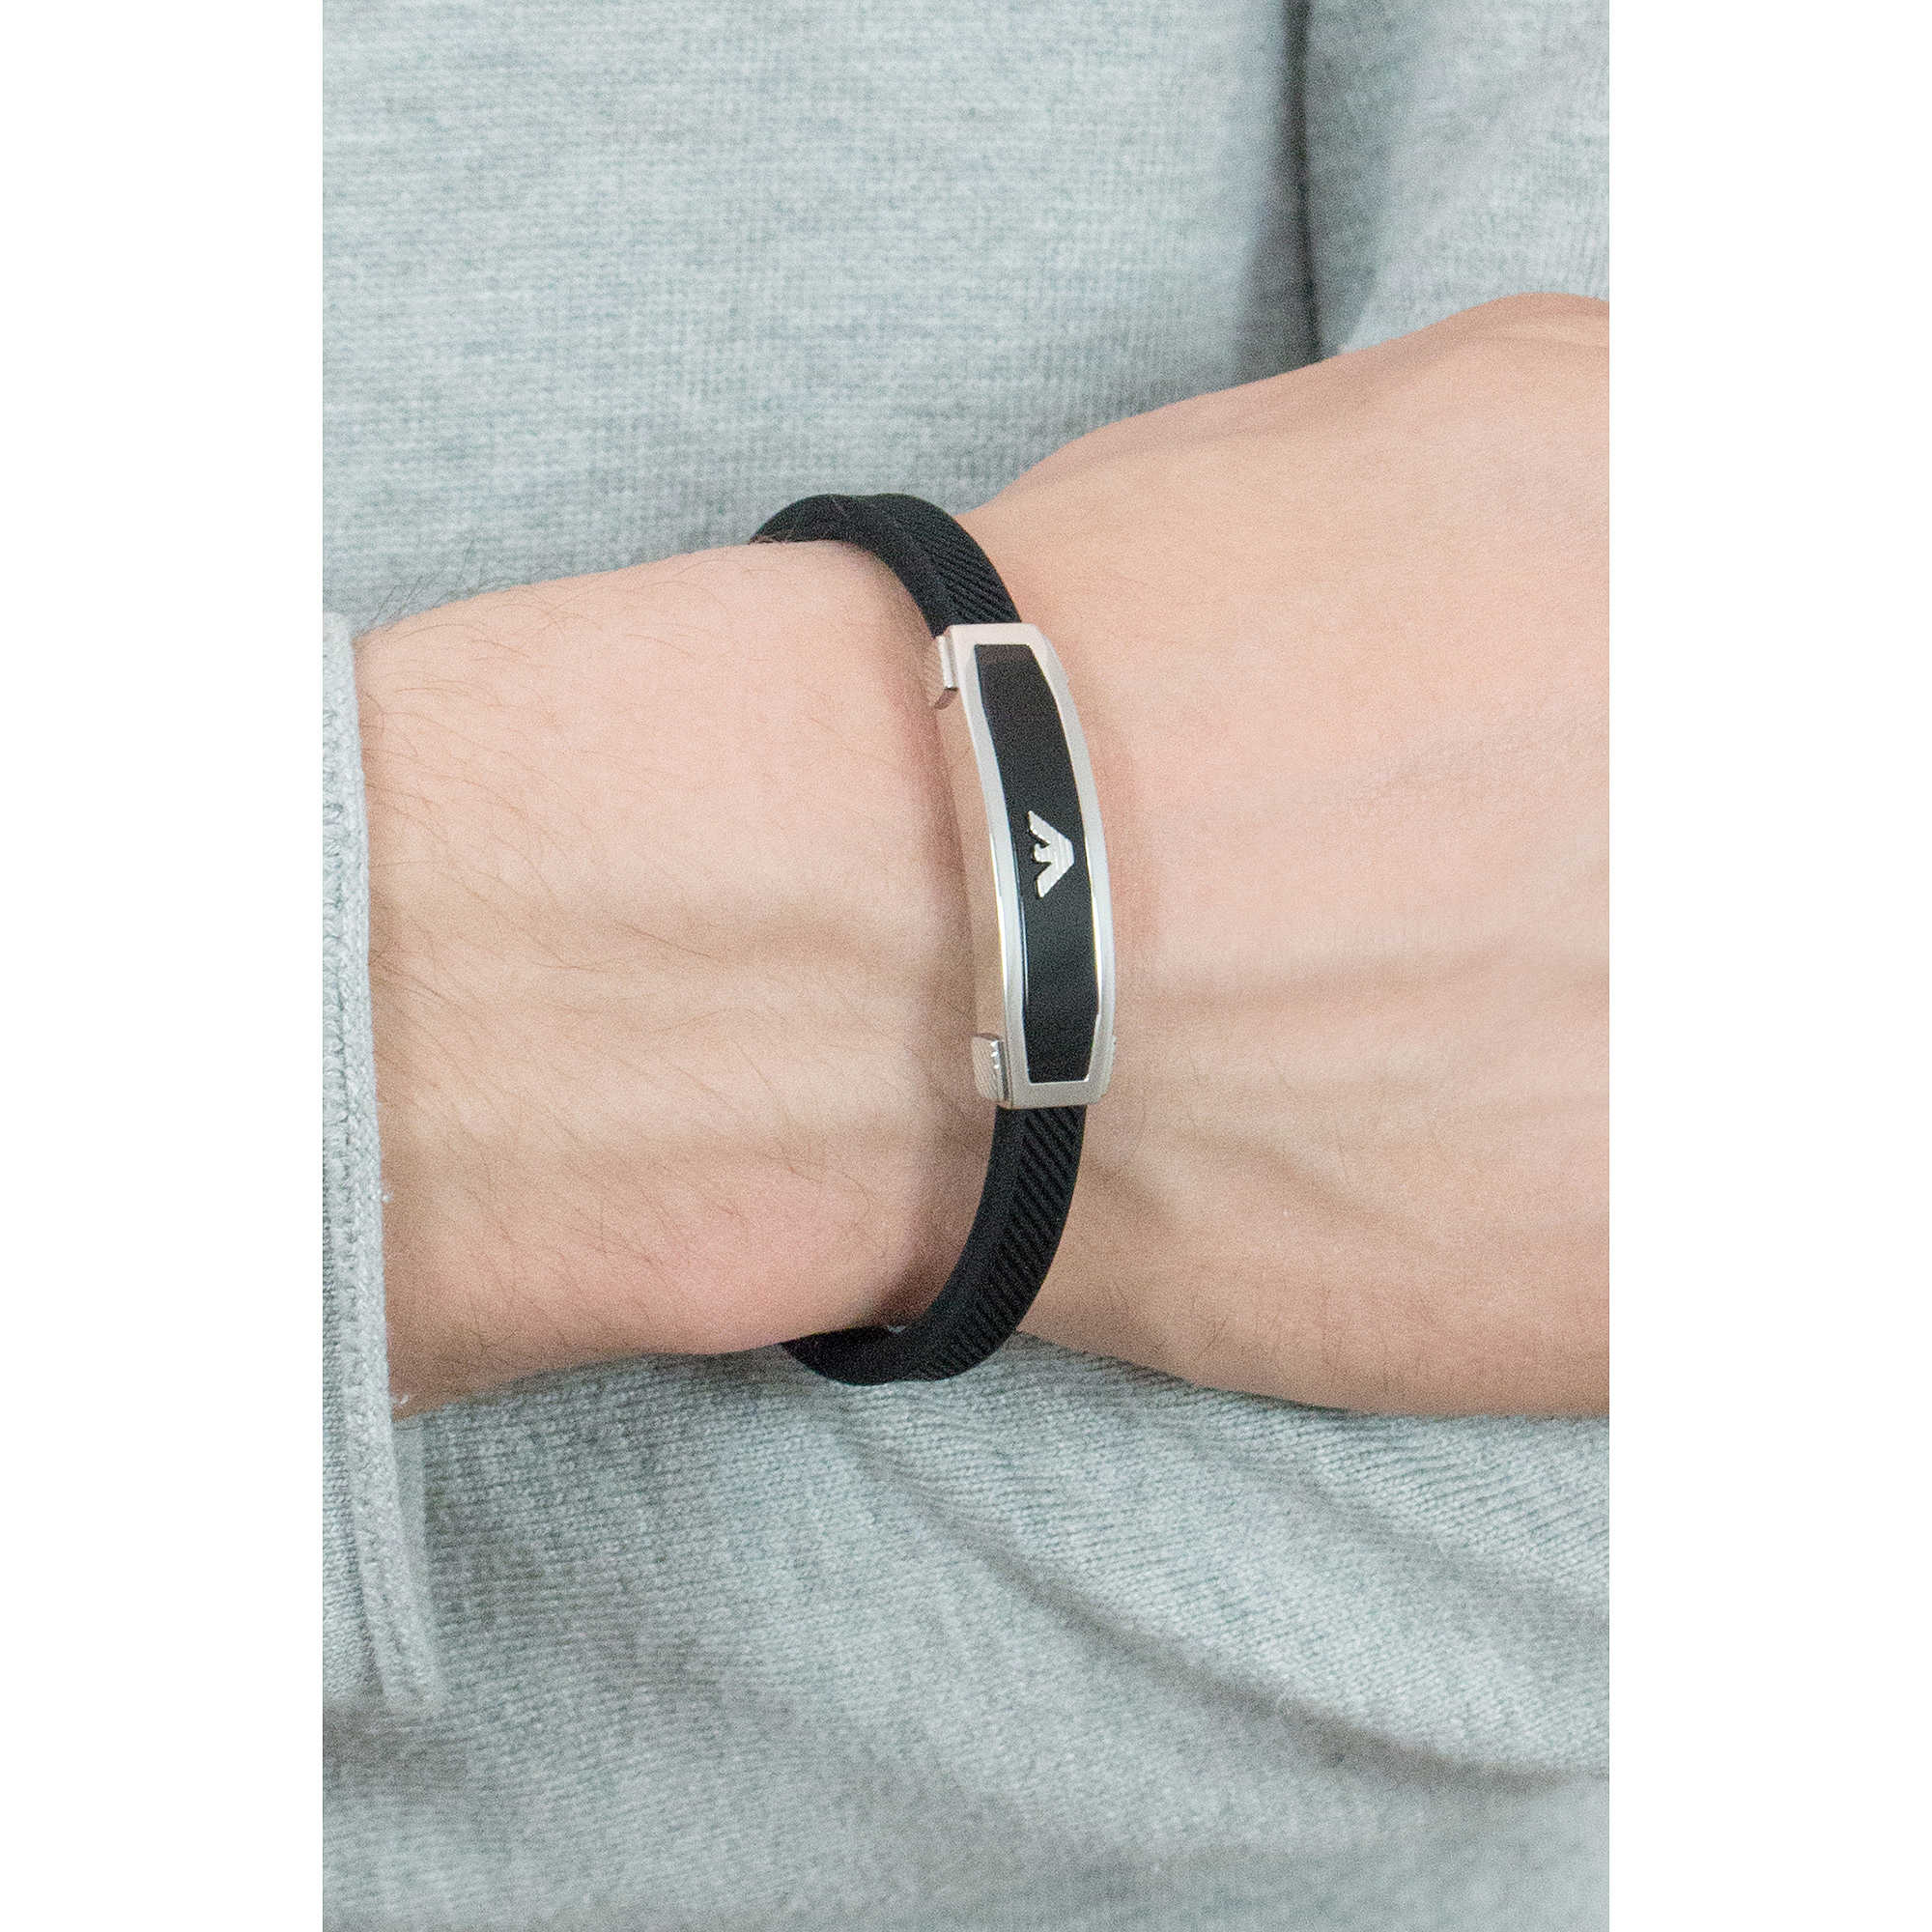 zoom. package bracelets Emporio Armani EGS1543040. zoom. bracelet man  jewellery Emporio Armani EGS1543040 68ac651bf50